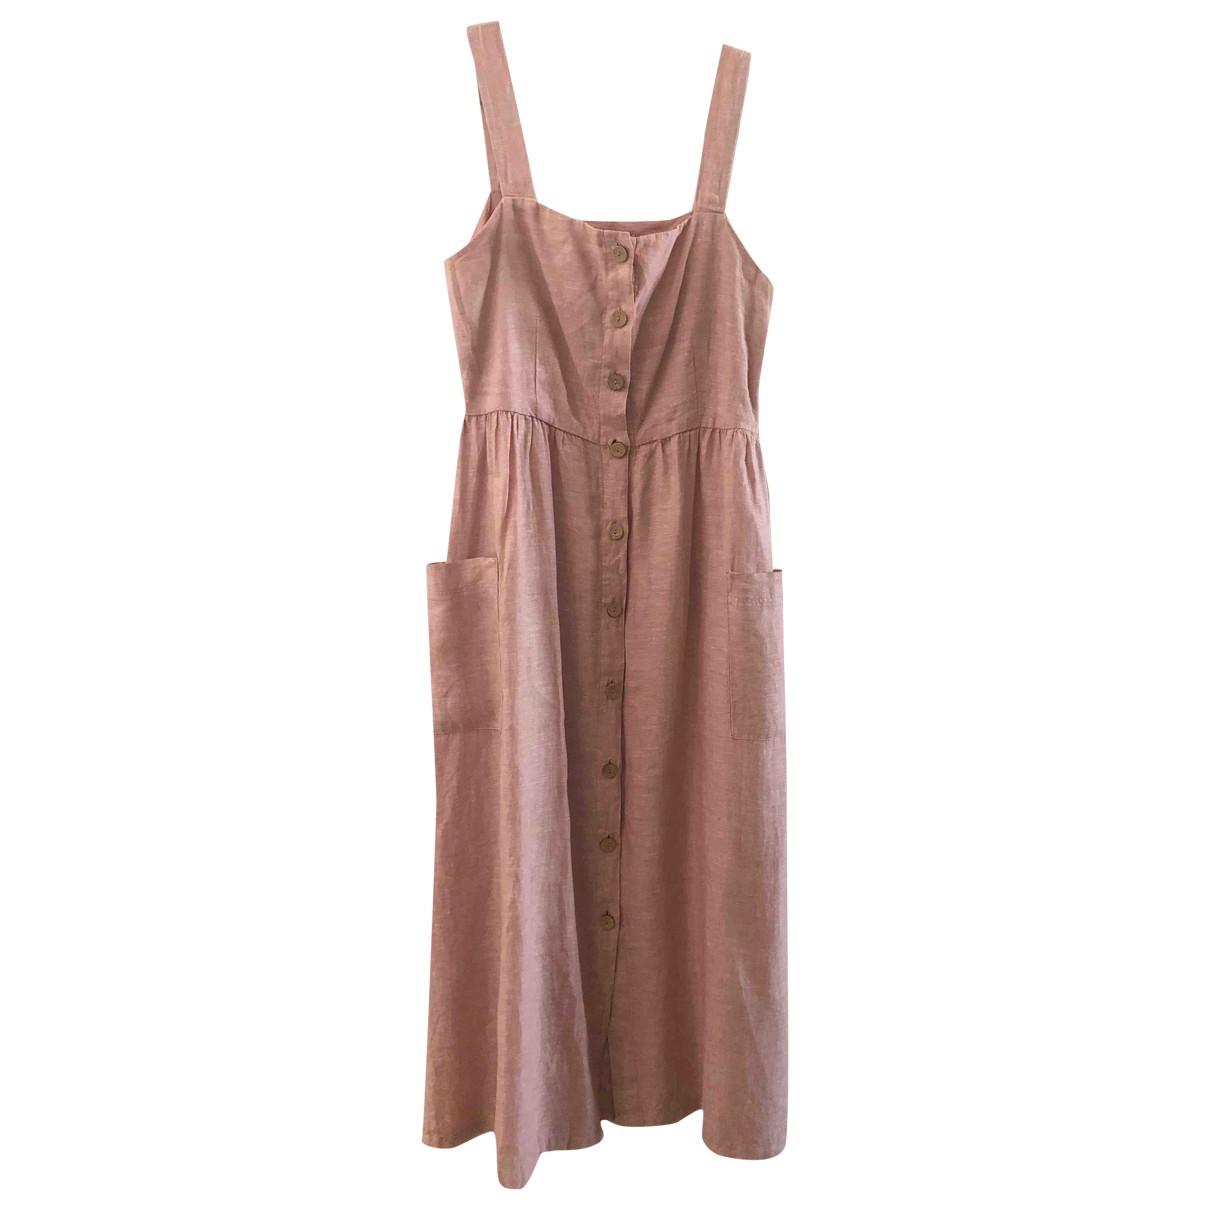 Rachel Zoe \N Pink Linen dress for Women 42 FR